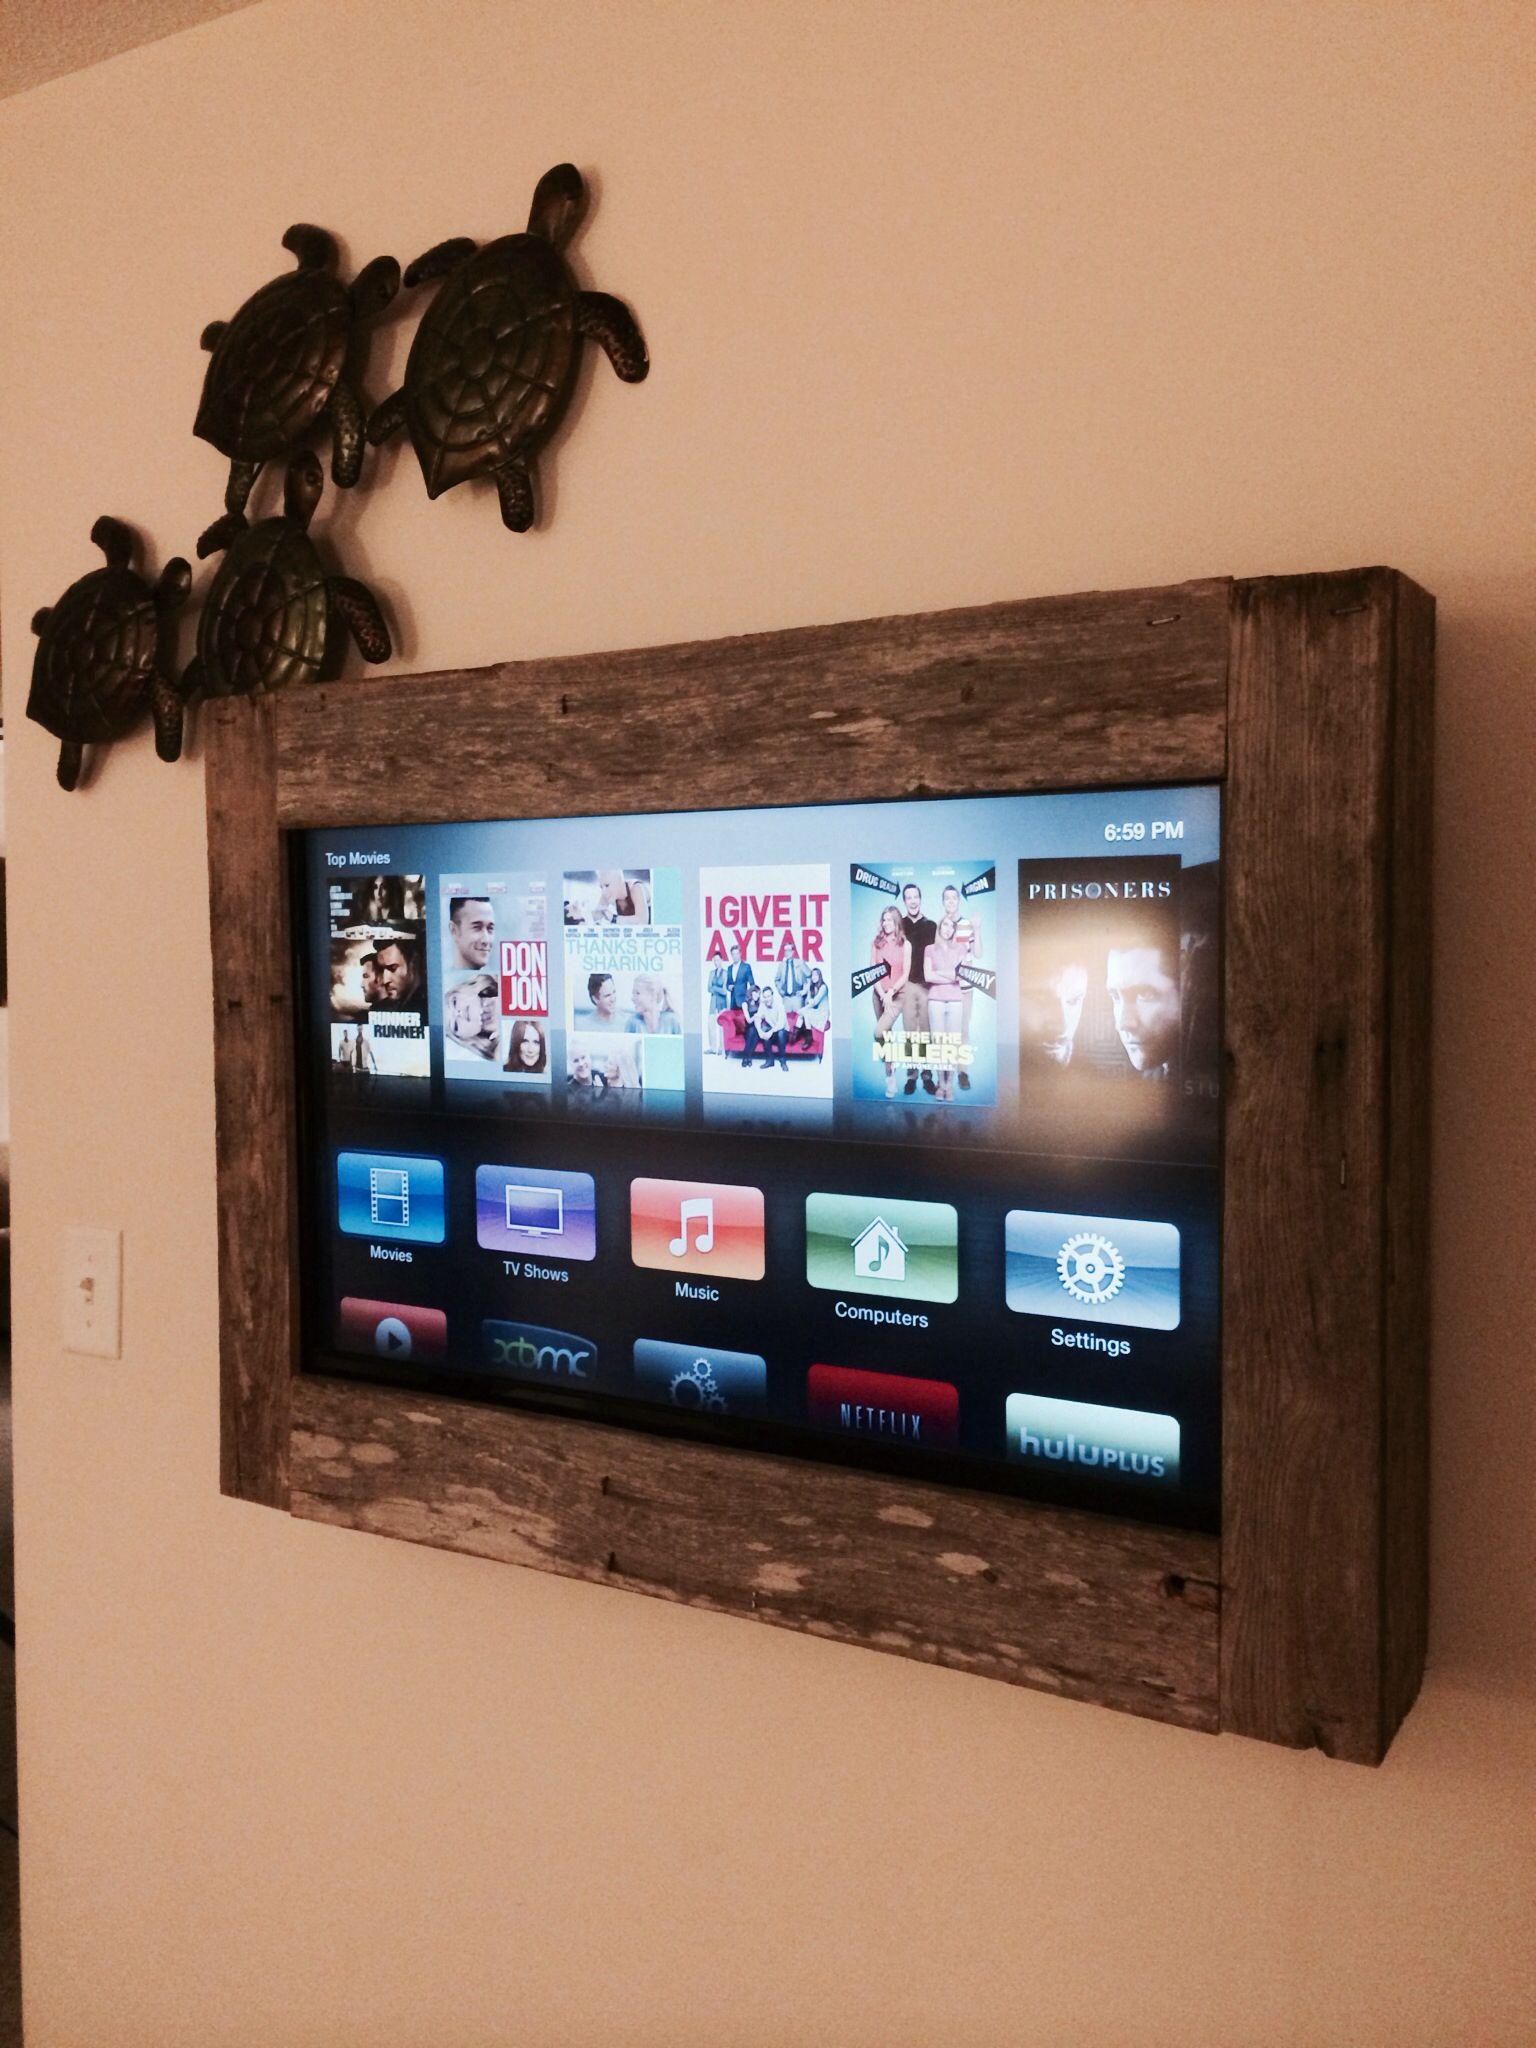 marco de madera para tele | Proyectos que debo intentar | Pinterest ...